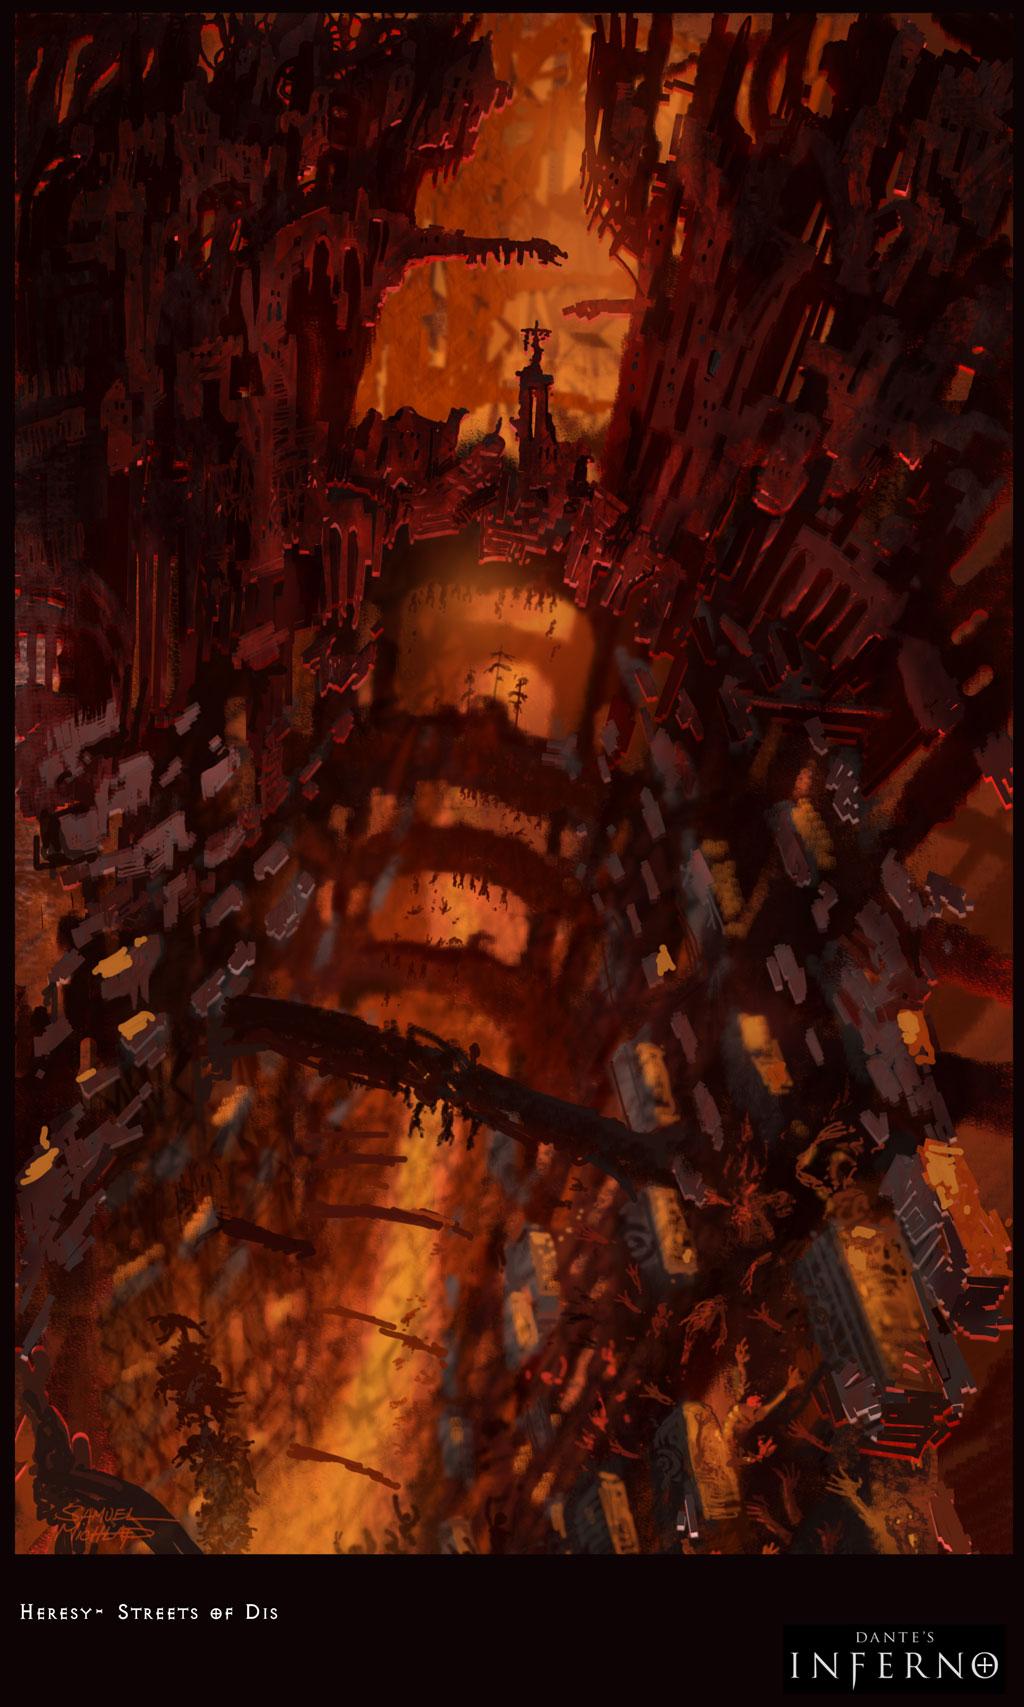 Dante S Inferno Final Ring Frozen People